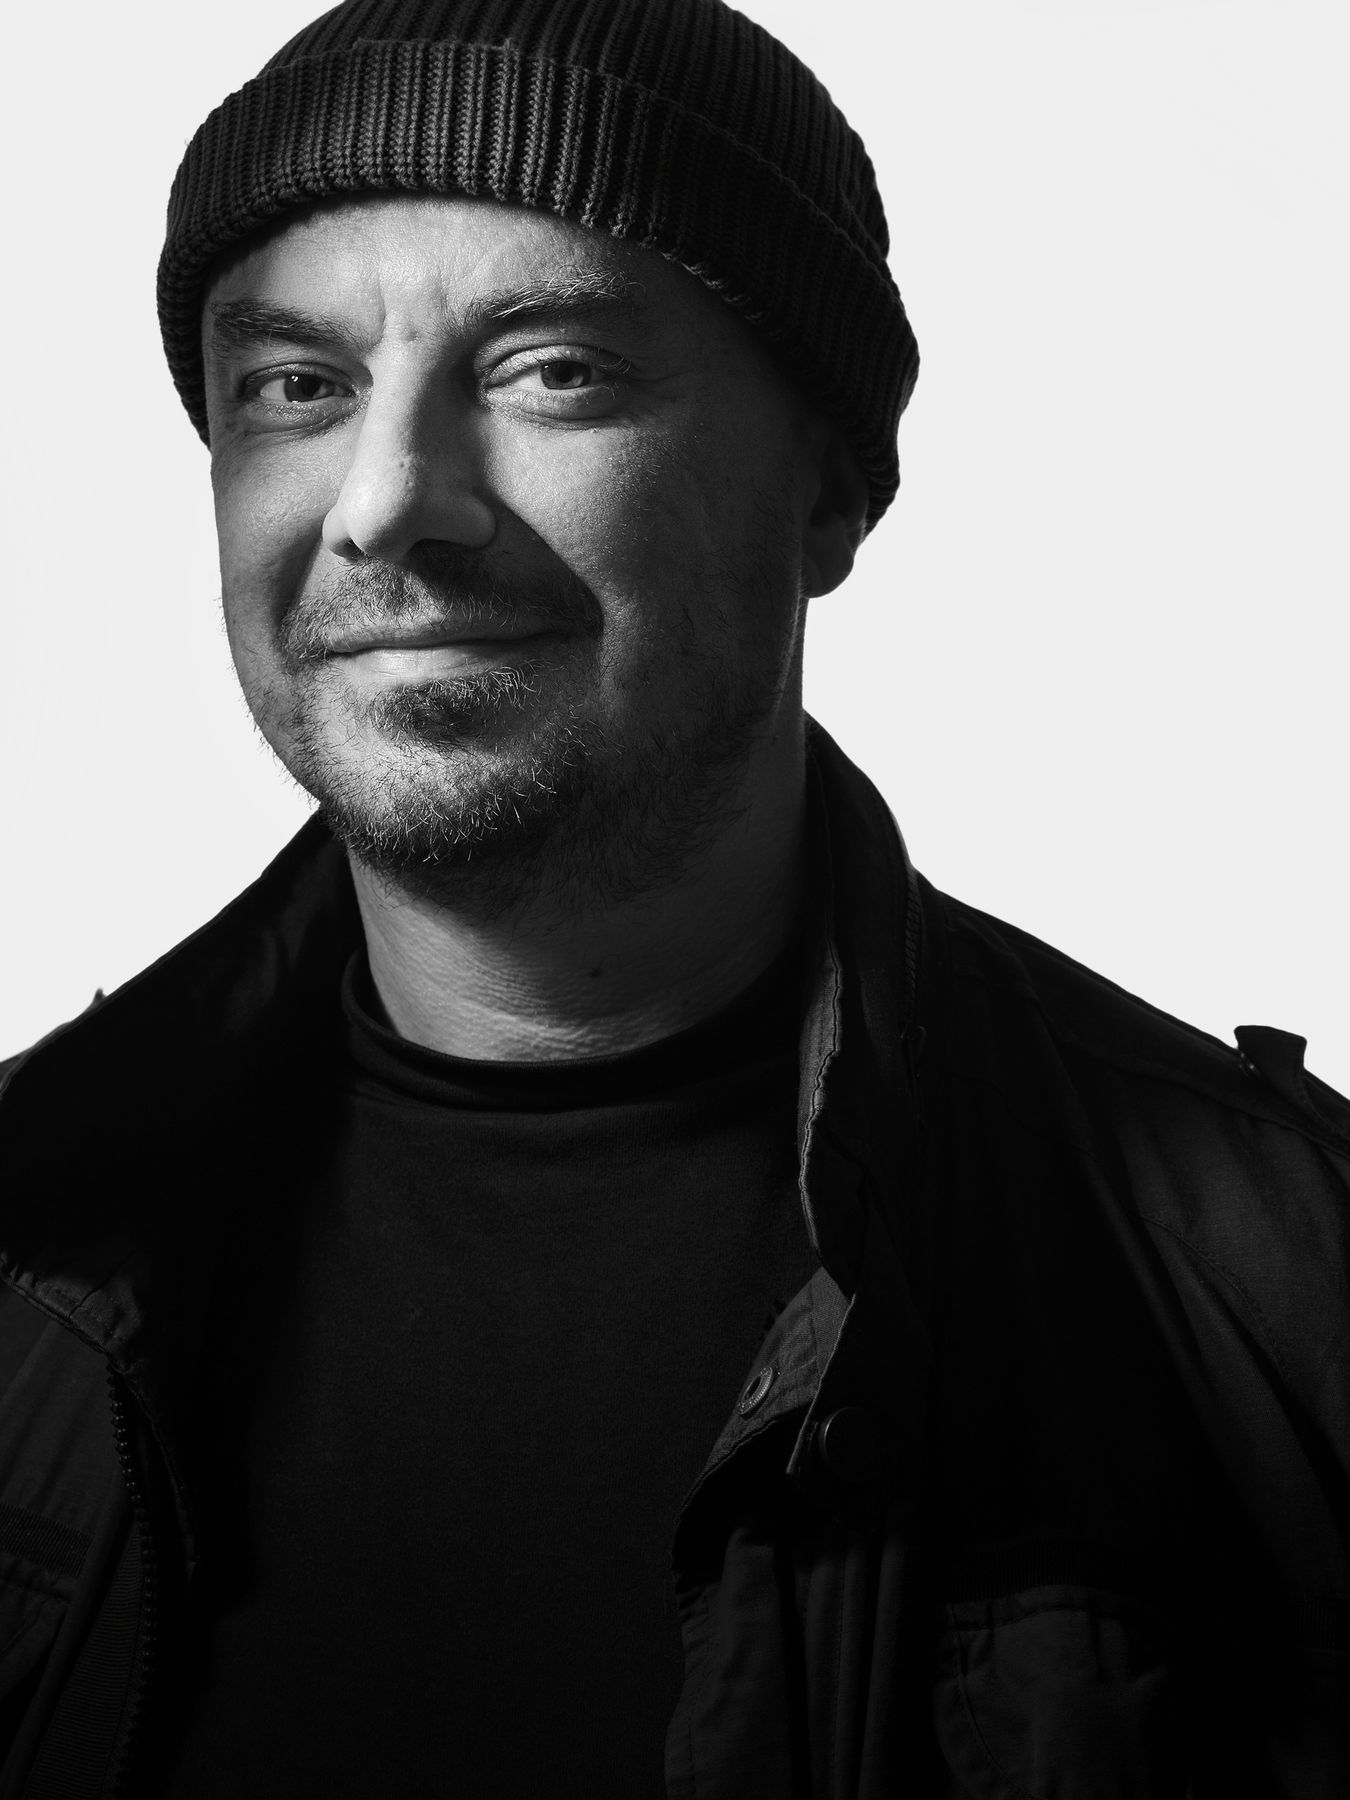 Влад Маленко poet fabulist director actor theater hat look smile grin поэт баснописец режиссер актер театр шапка взгляд улыбка ухмылка